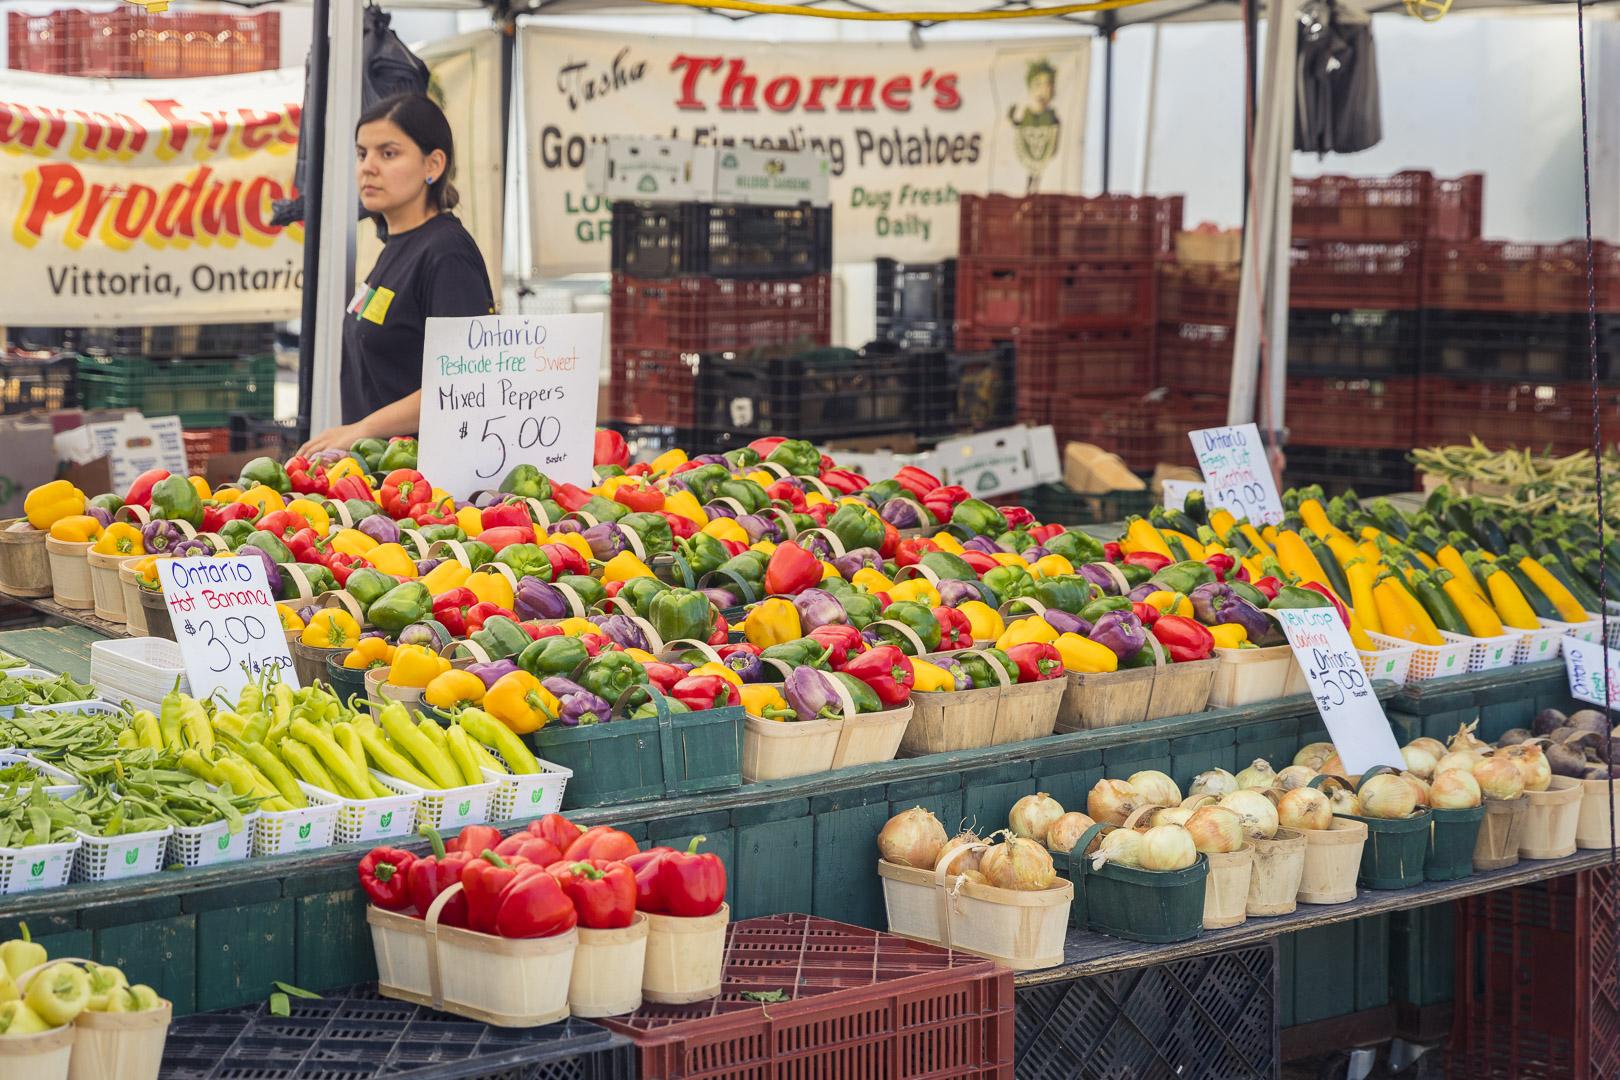 Farm Fresh Produce from Vittoria, Ontario